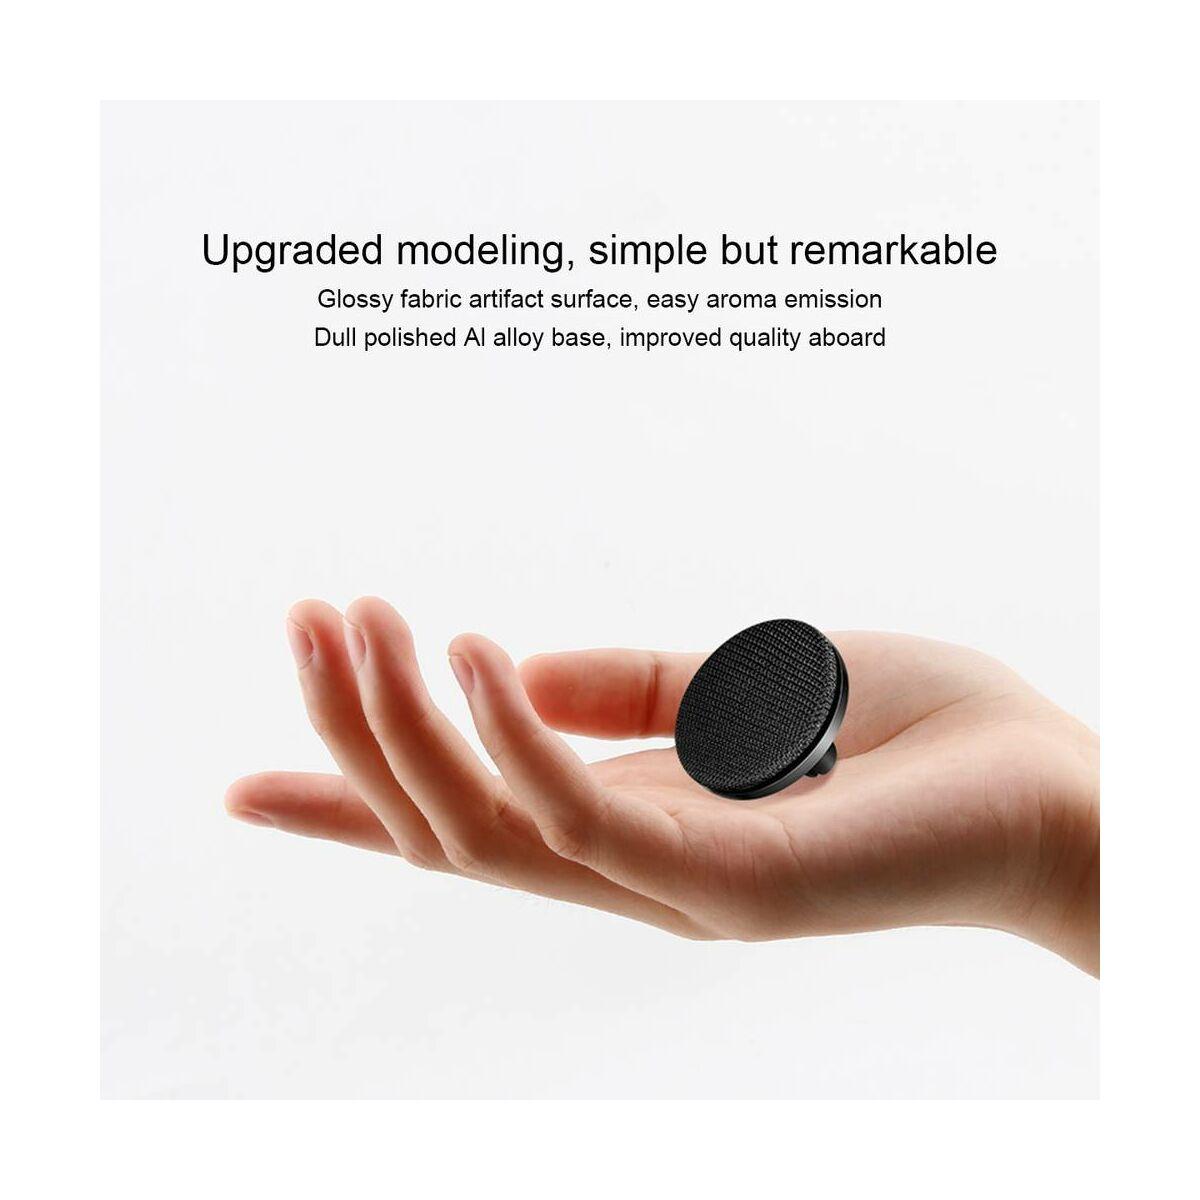 Baseus autós illatosító, Fabric Artifact, fekete (SUXUN-BY01)